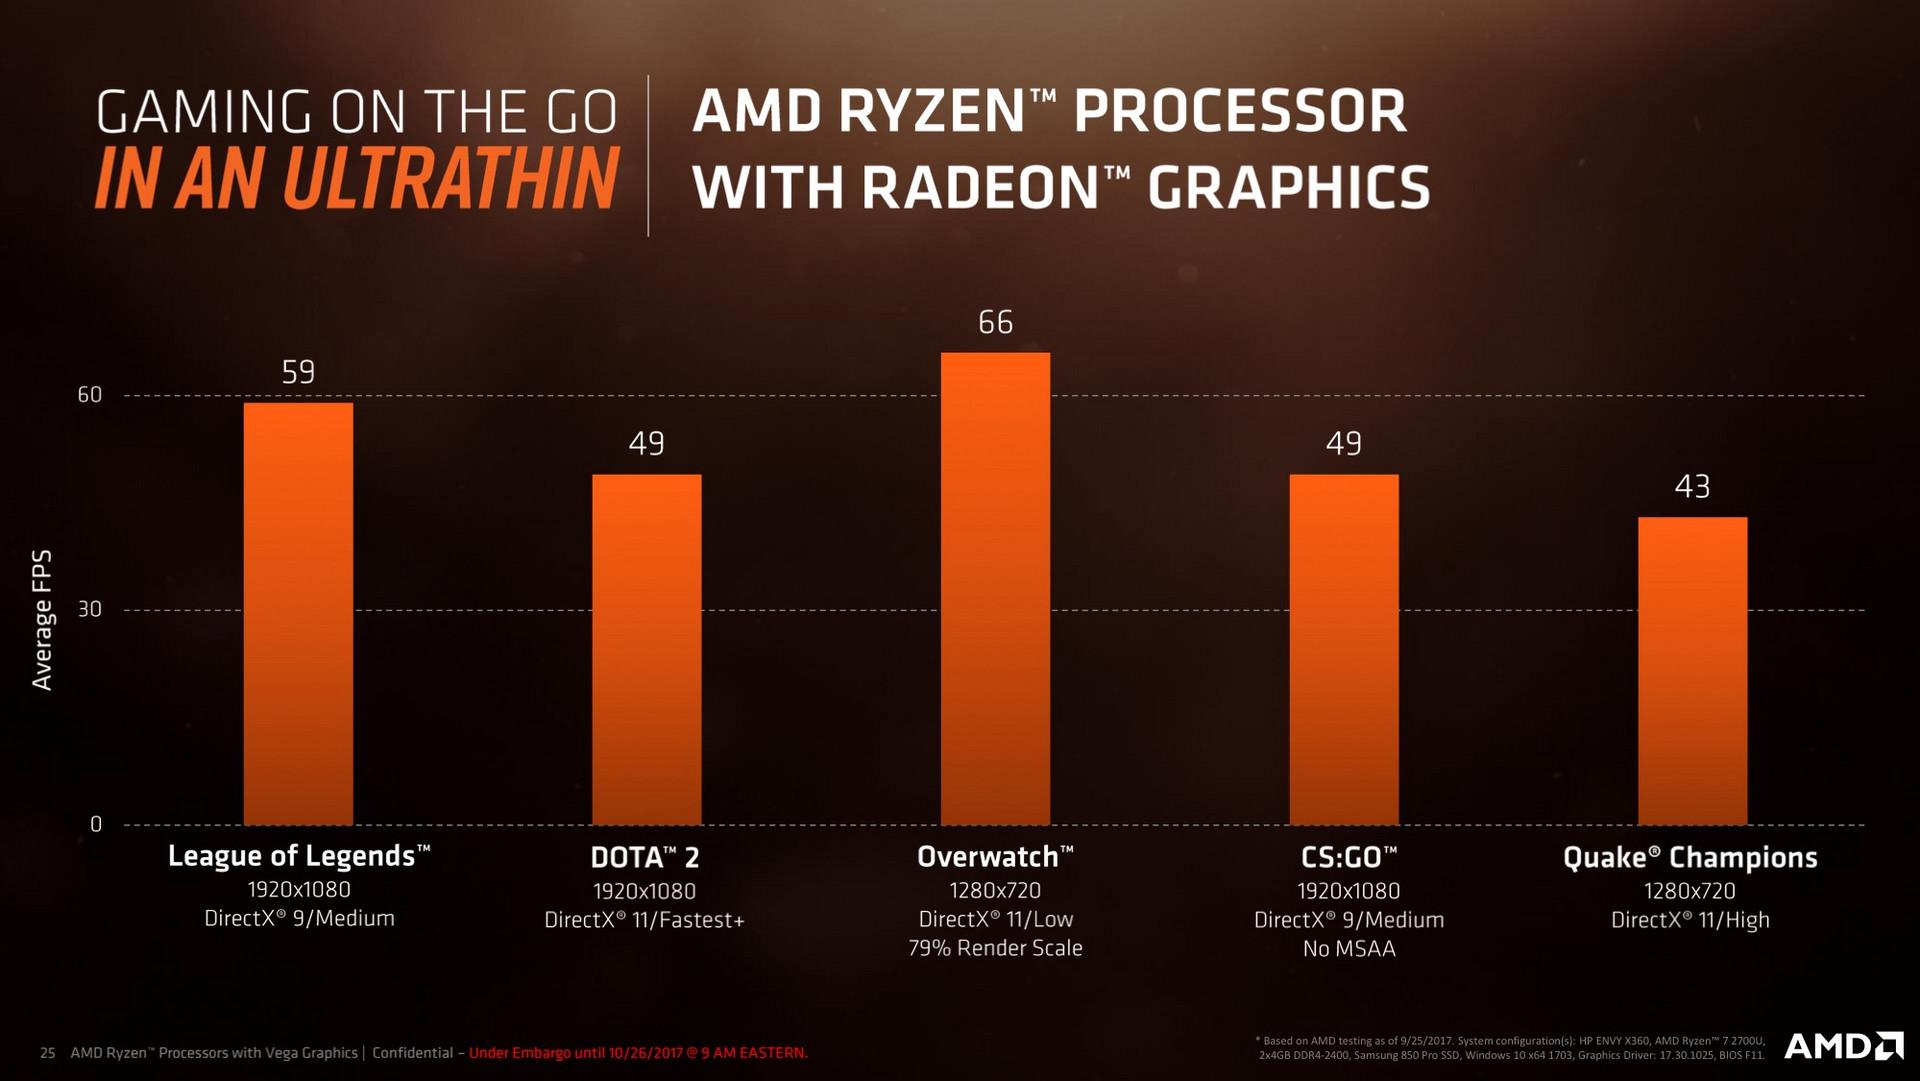 AMD Ryzen Mobile (Raven Ridge) - Back to the Top